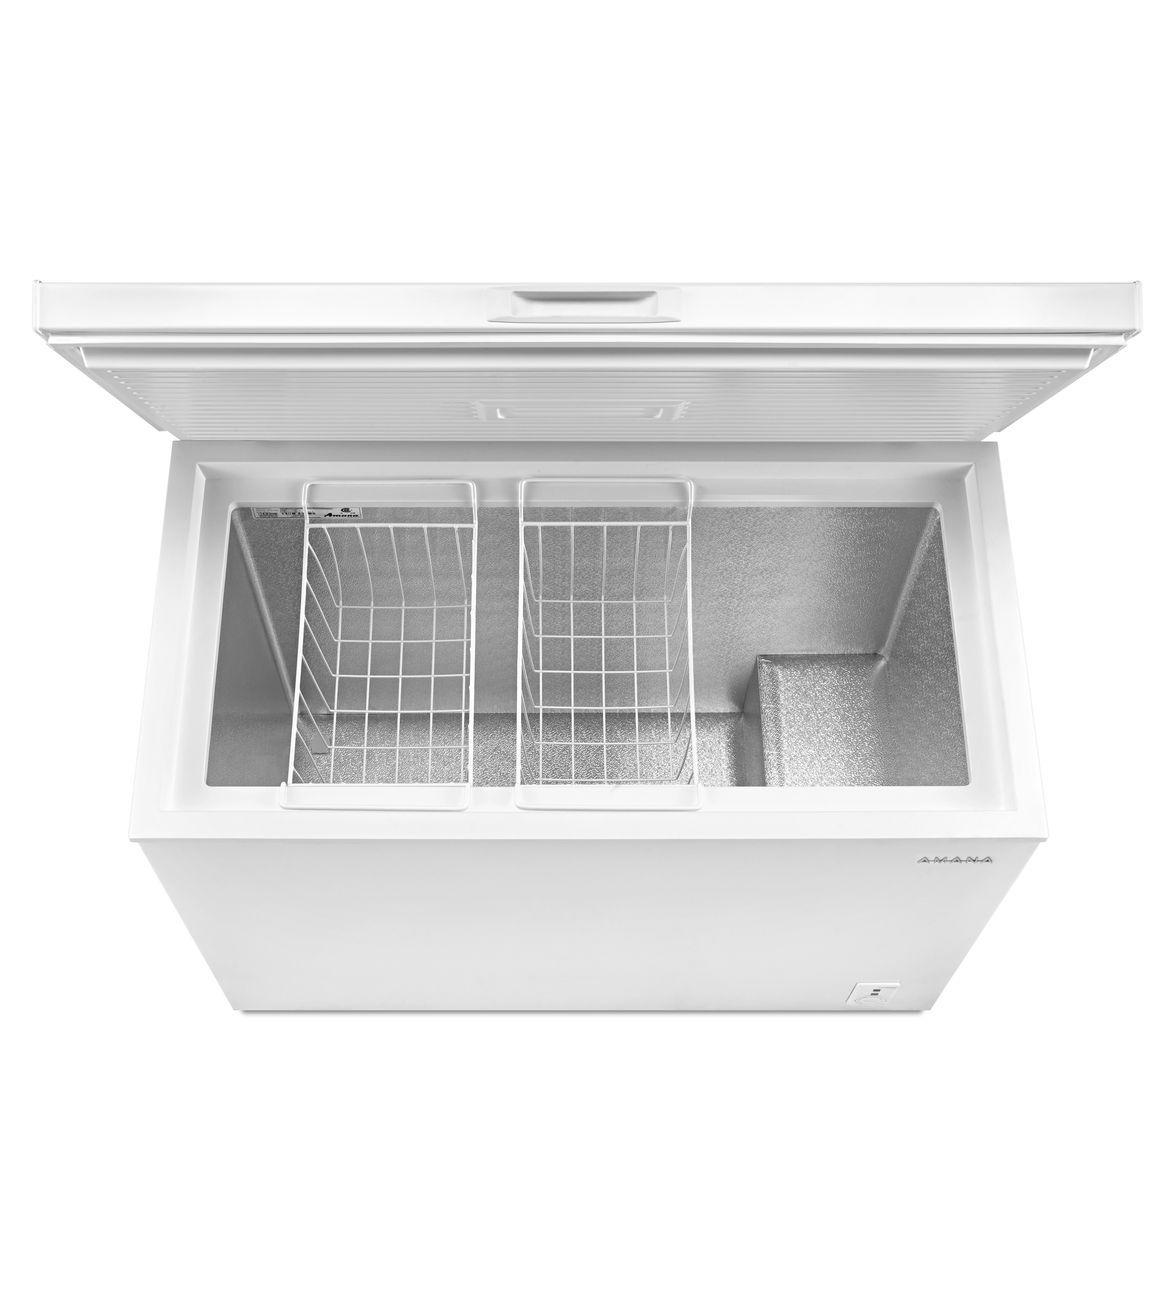 sc 1 st  Picture Lights & Upright Freezer Storage Baskets